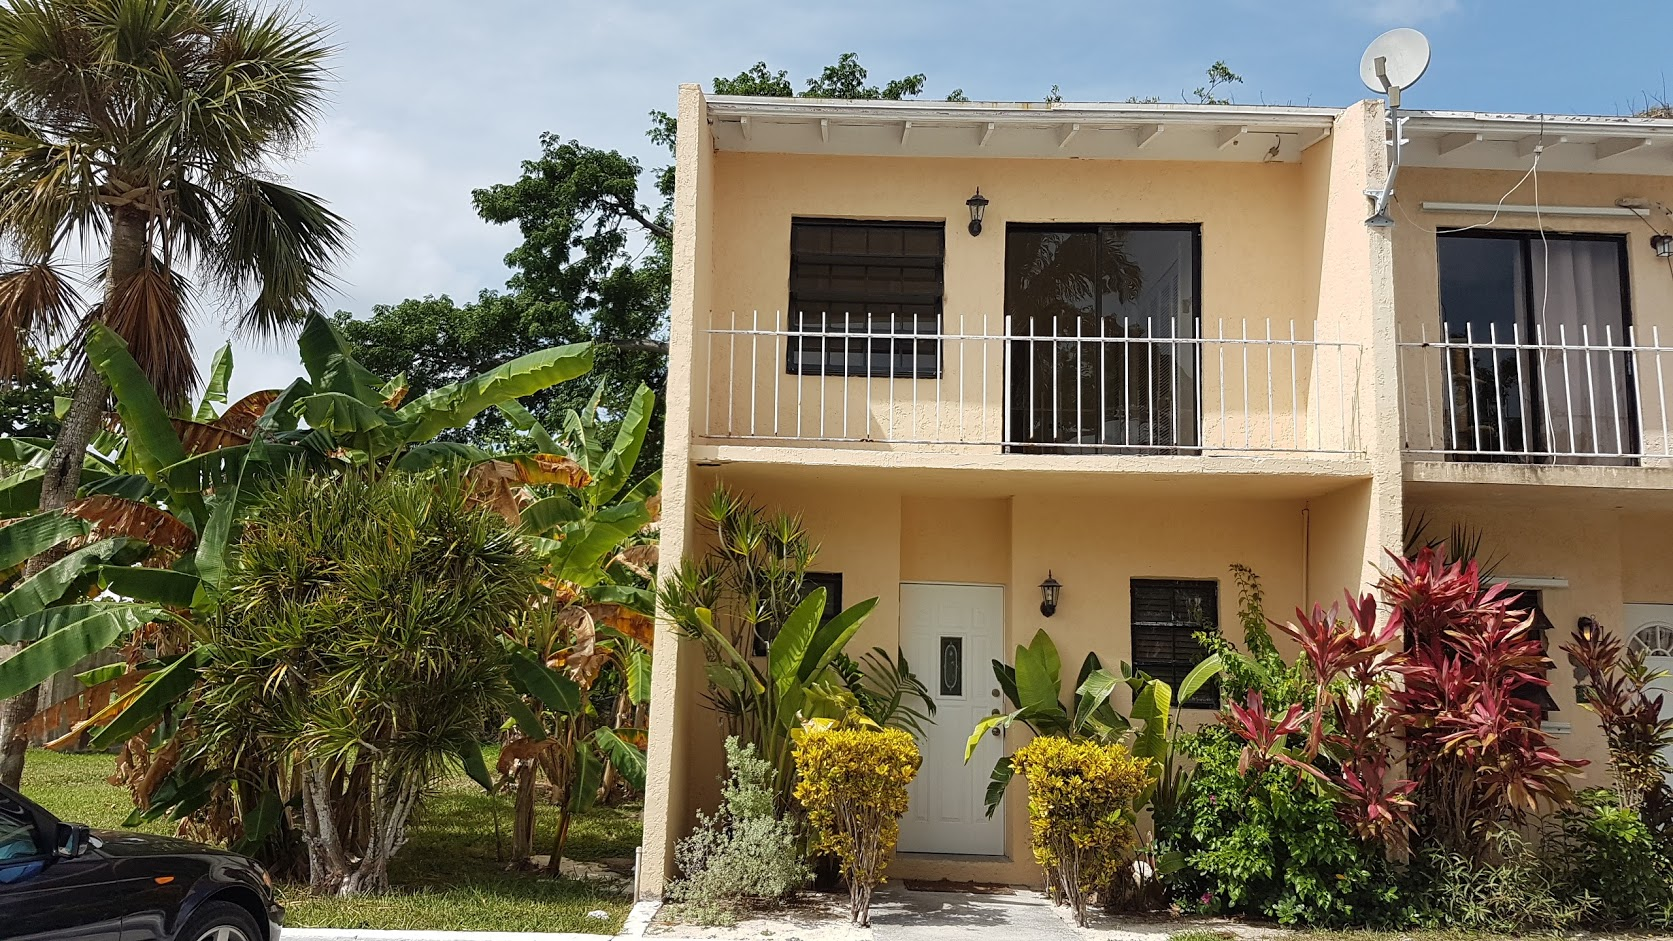 Co-op / Condo for Sale at Westward Villas Condo, Cable Beach - MLS 30321 Sandyport, Cable Beach, Nassau And Paradise Island Bahamas